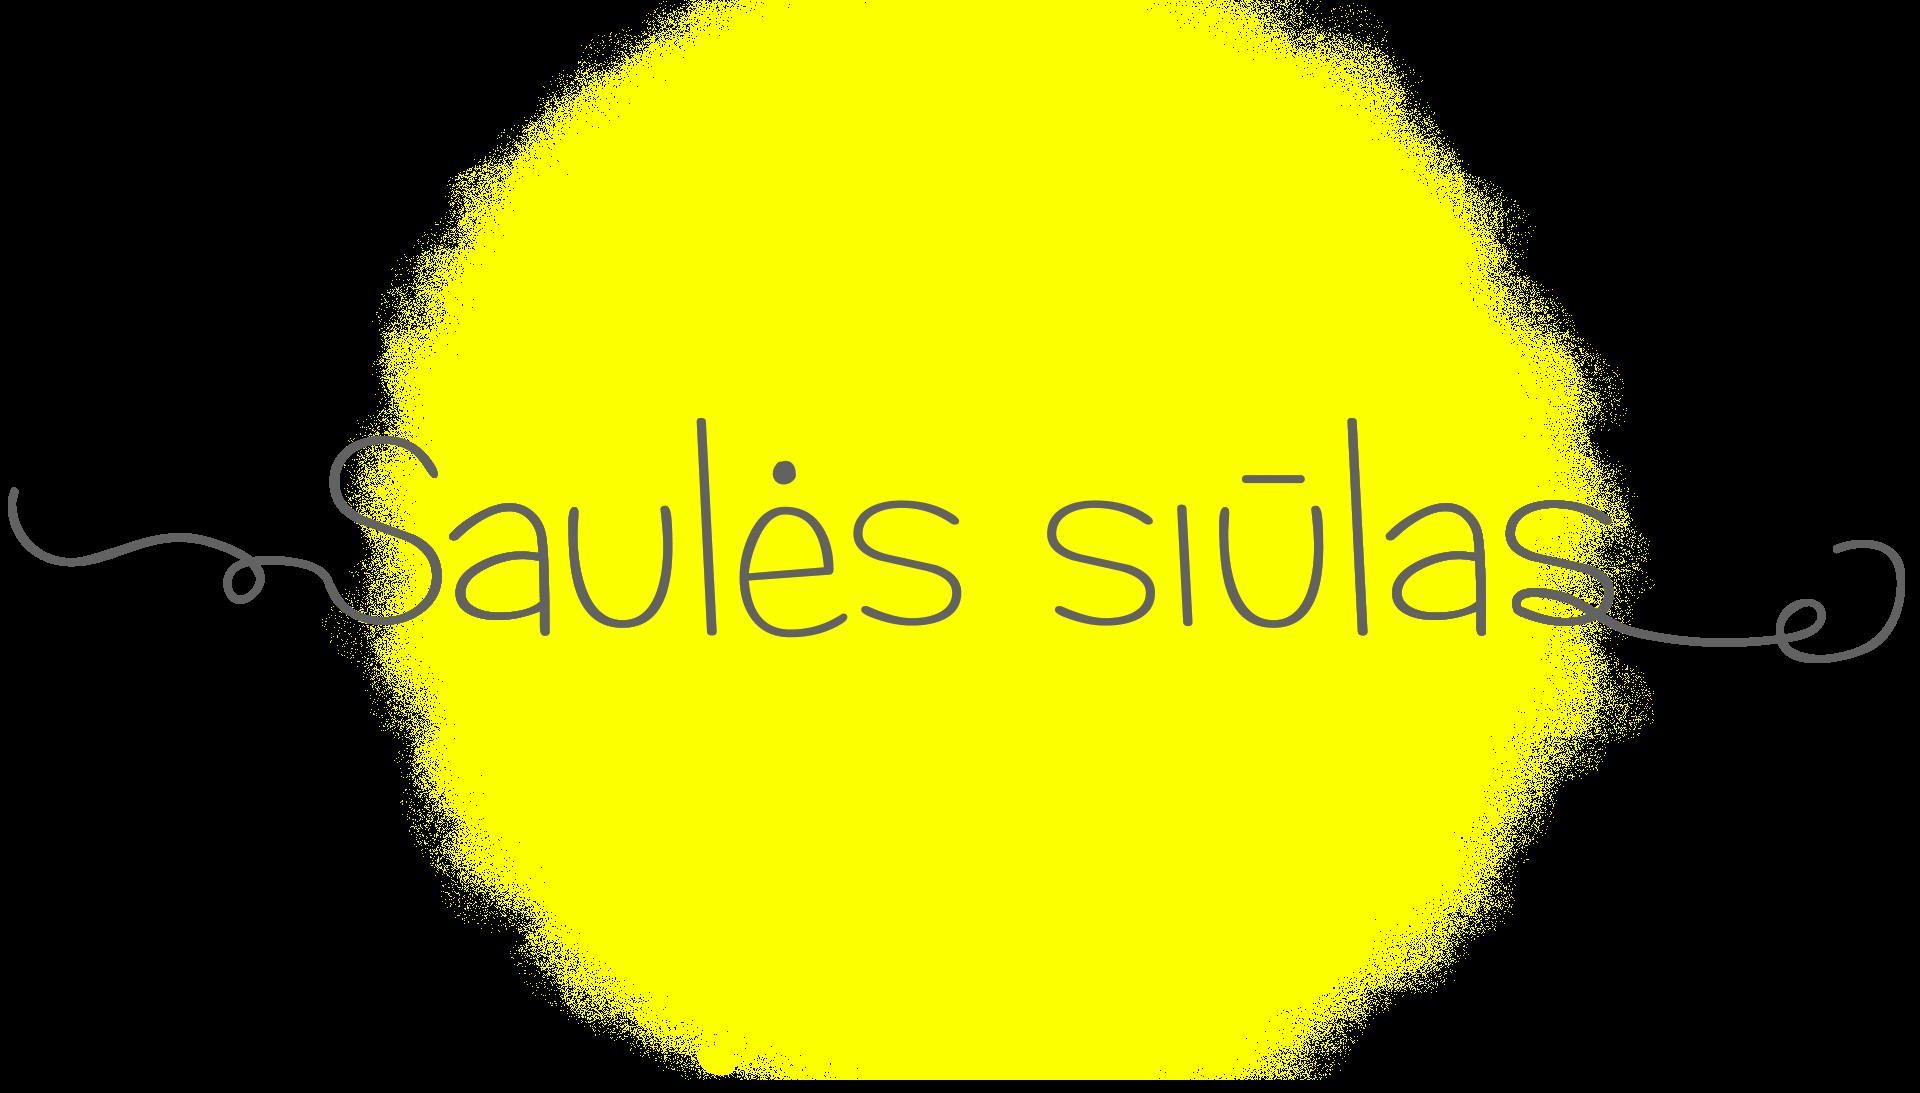 saulessiulas